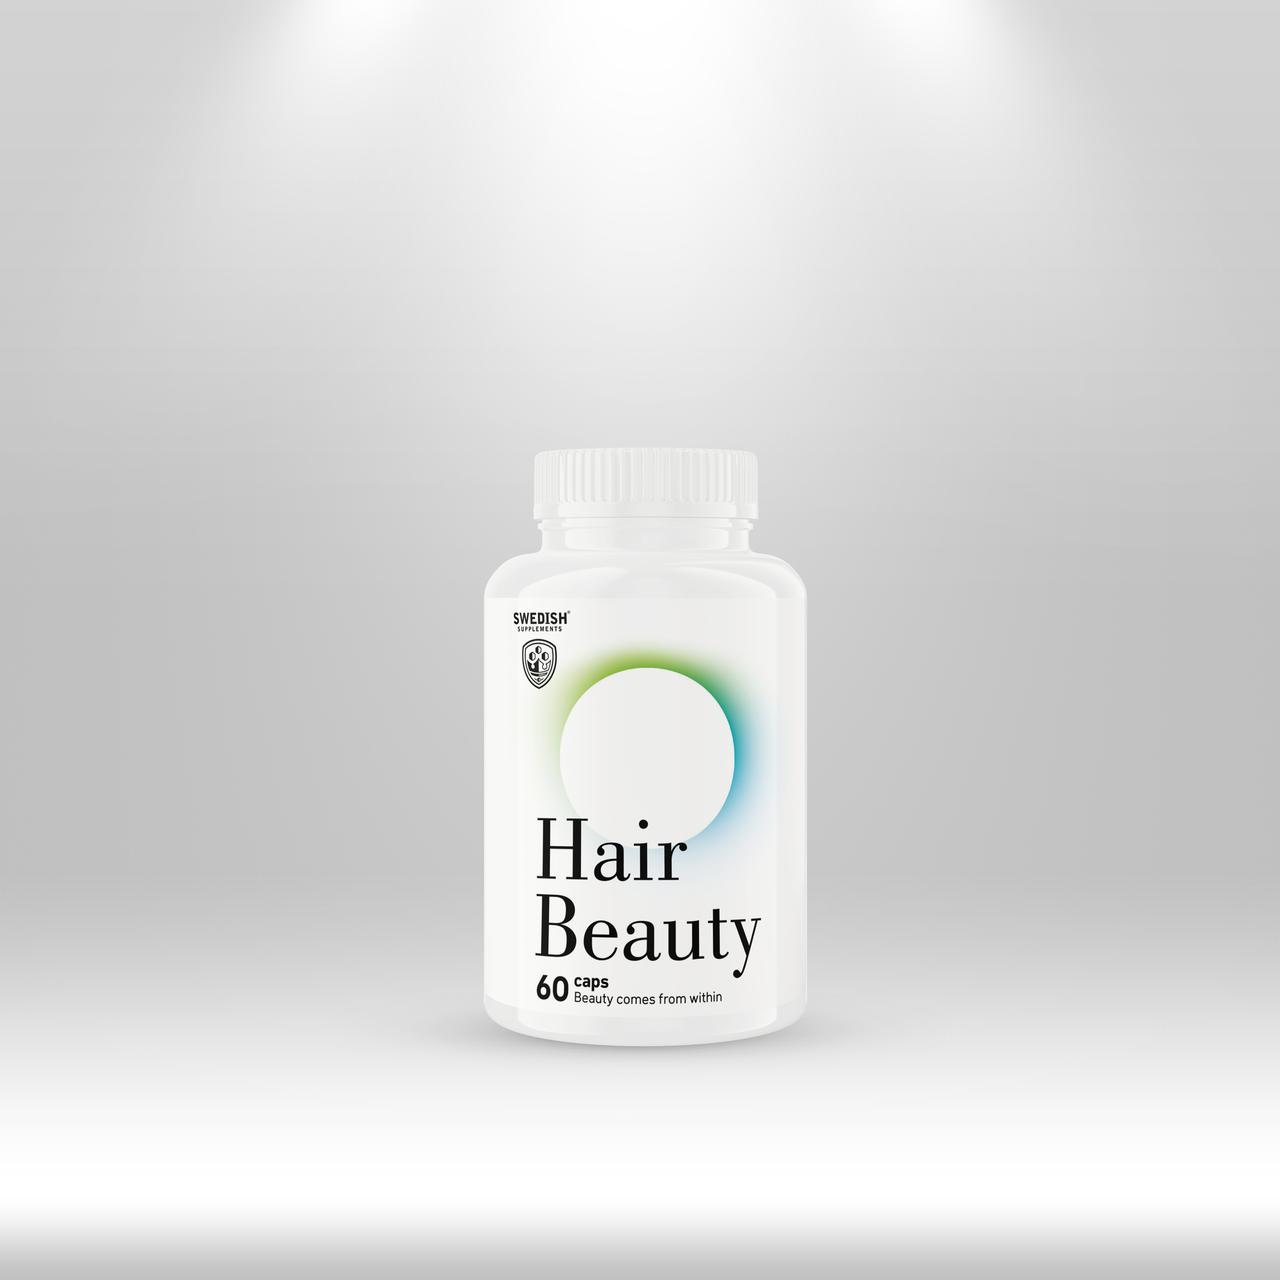 Swedish Supplements Beauty Hair, 60 caps